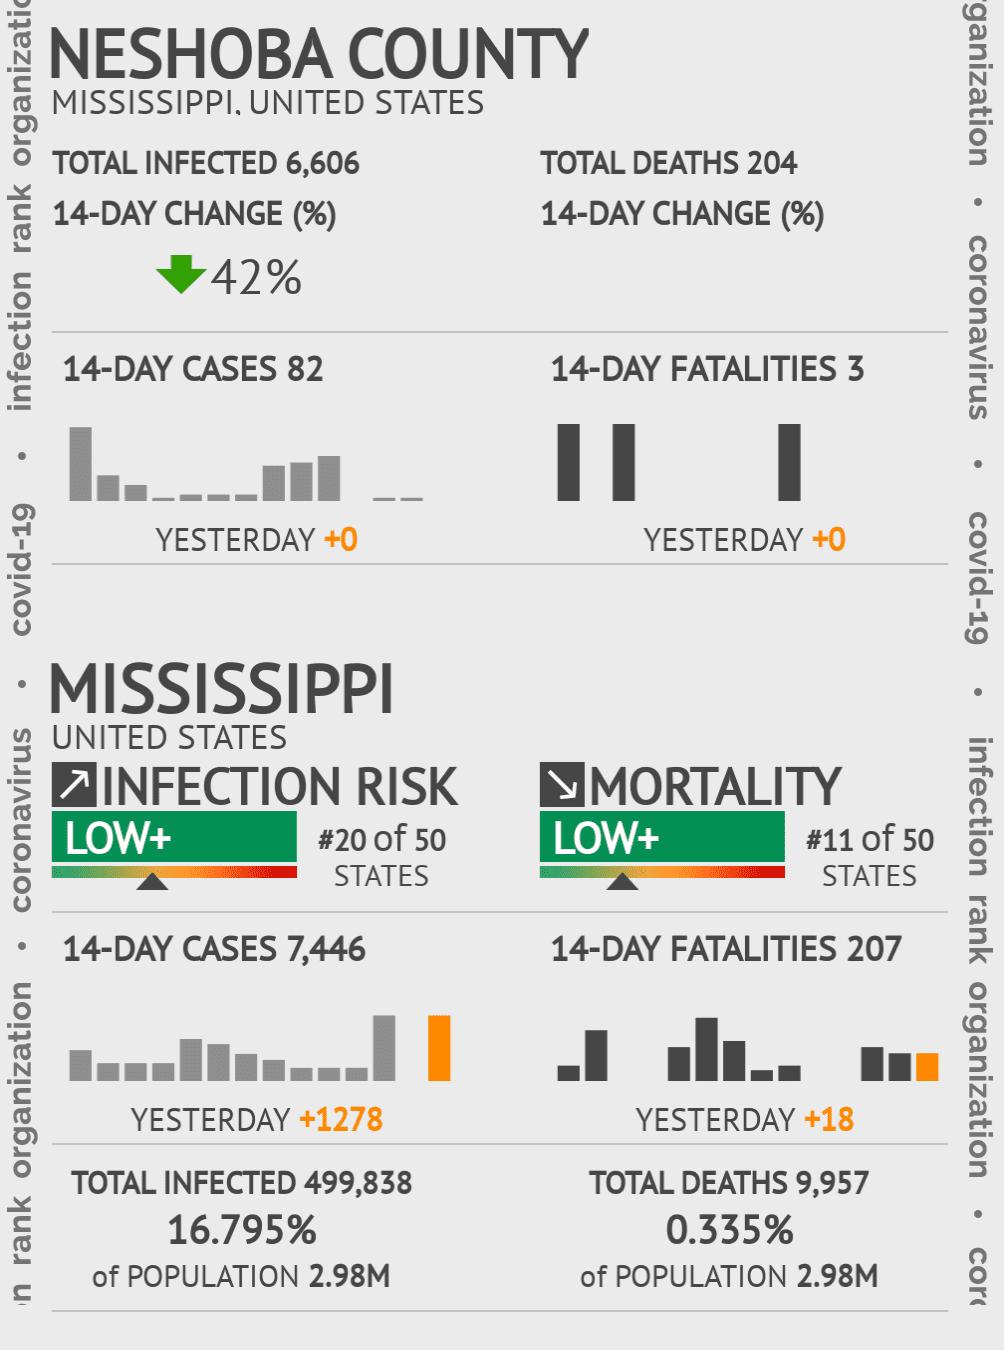 Neshoba County Coronavirus Covid-19 Risk of Infection on July 24, 2021